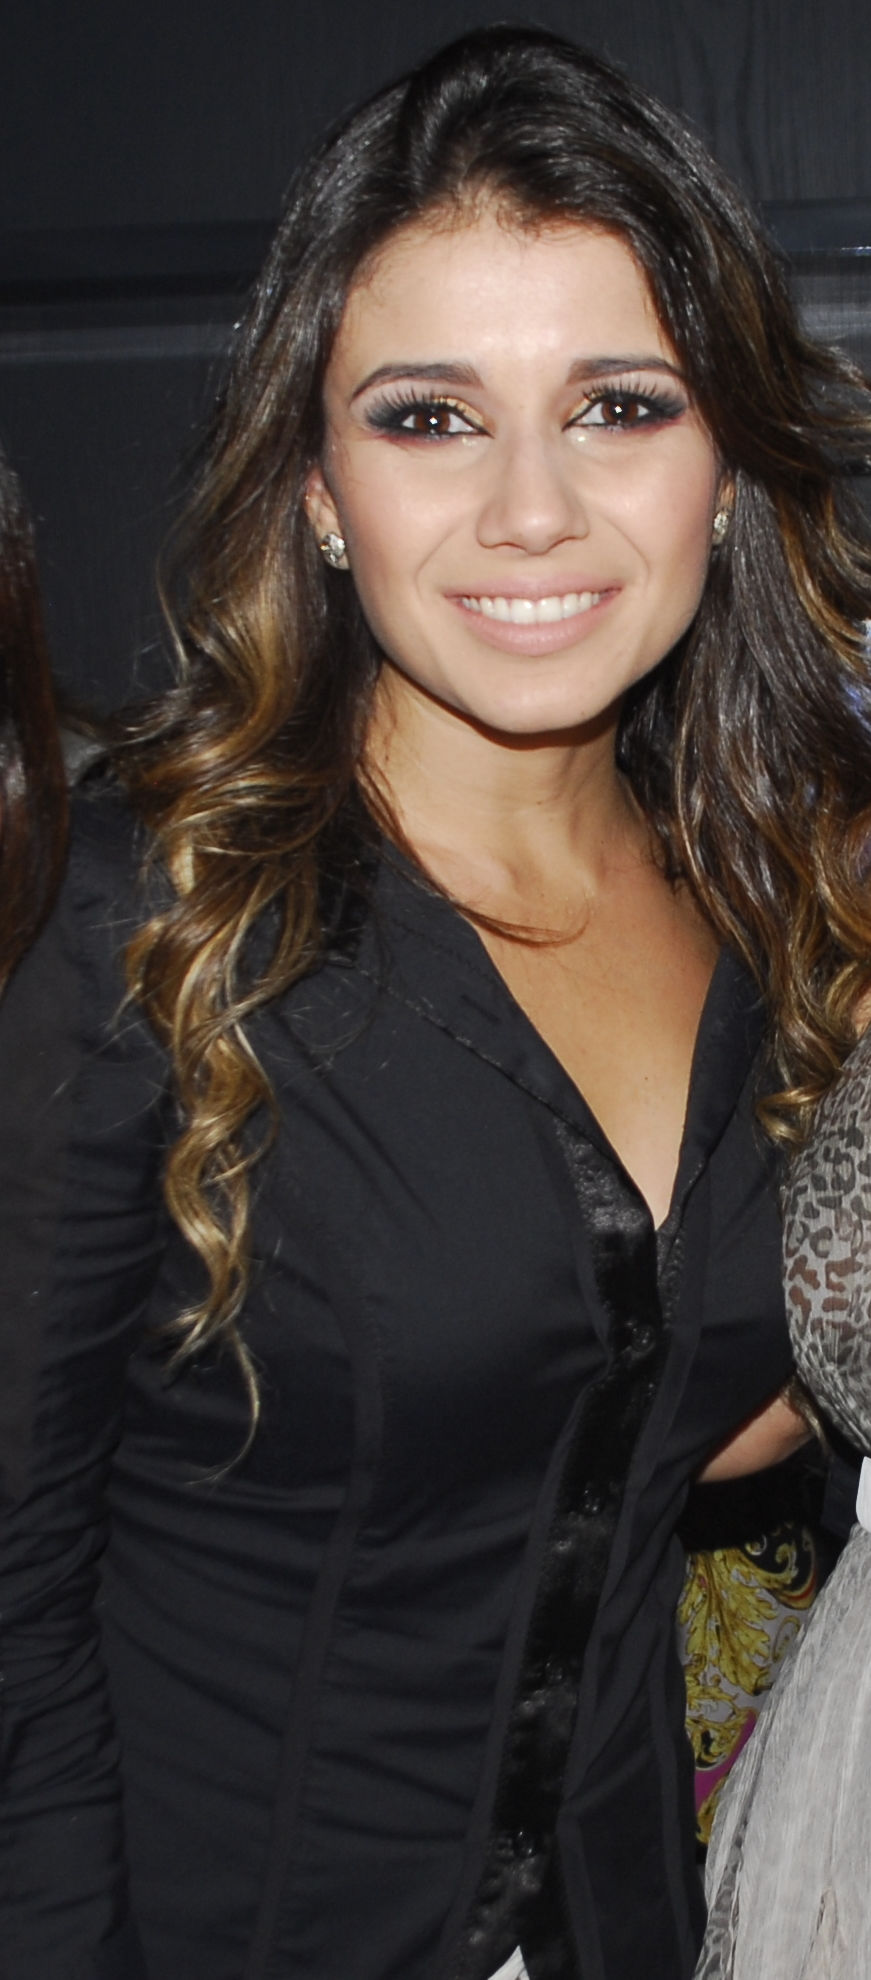 Photo of Paula Fernandes: Brazilian singer